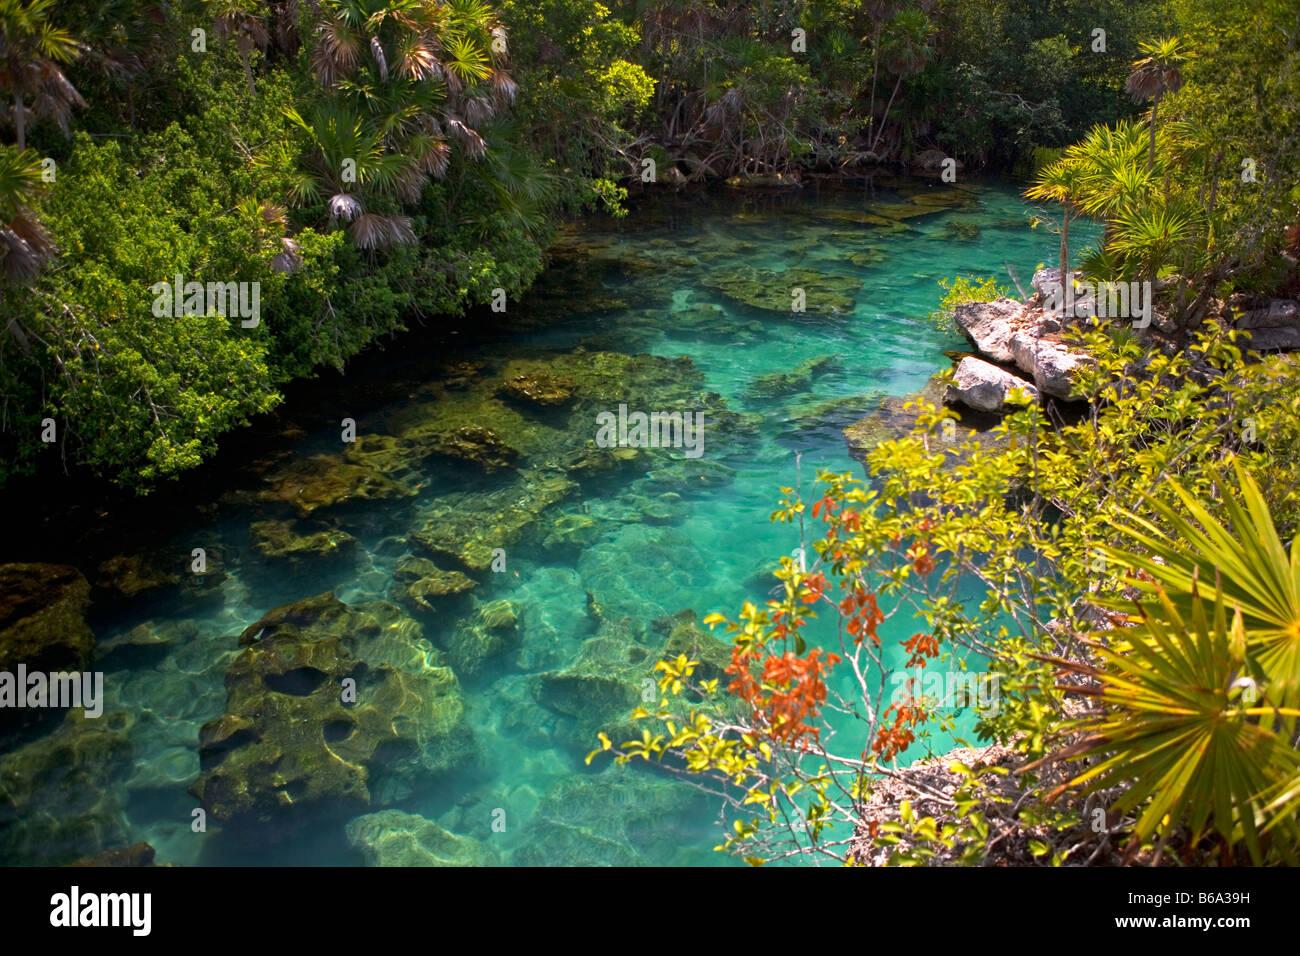 Mexico Quintana Roo Xel Ha Xel Ha Nature Marine Park